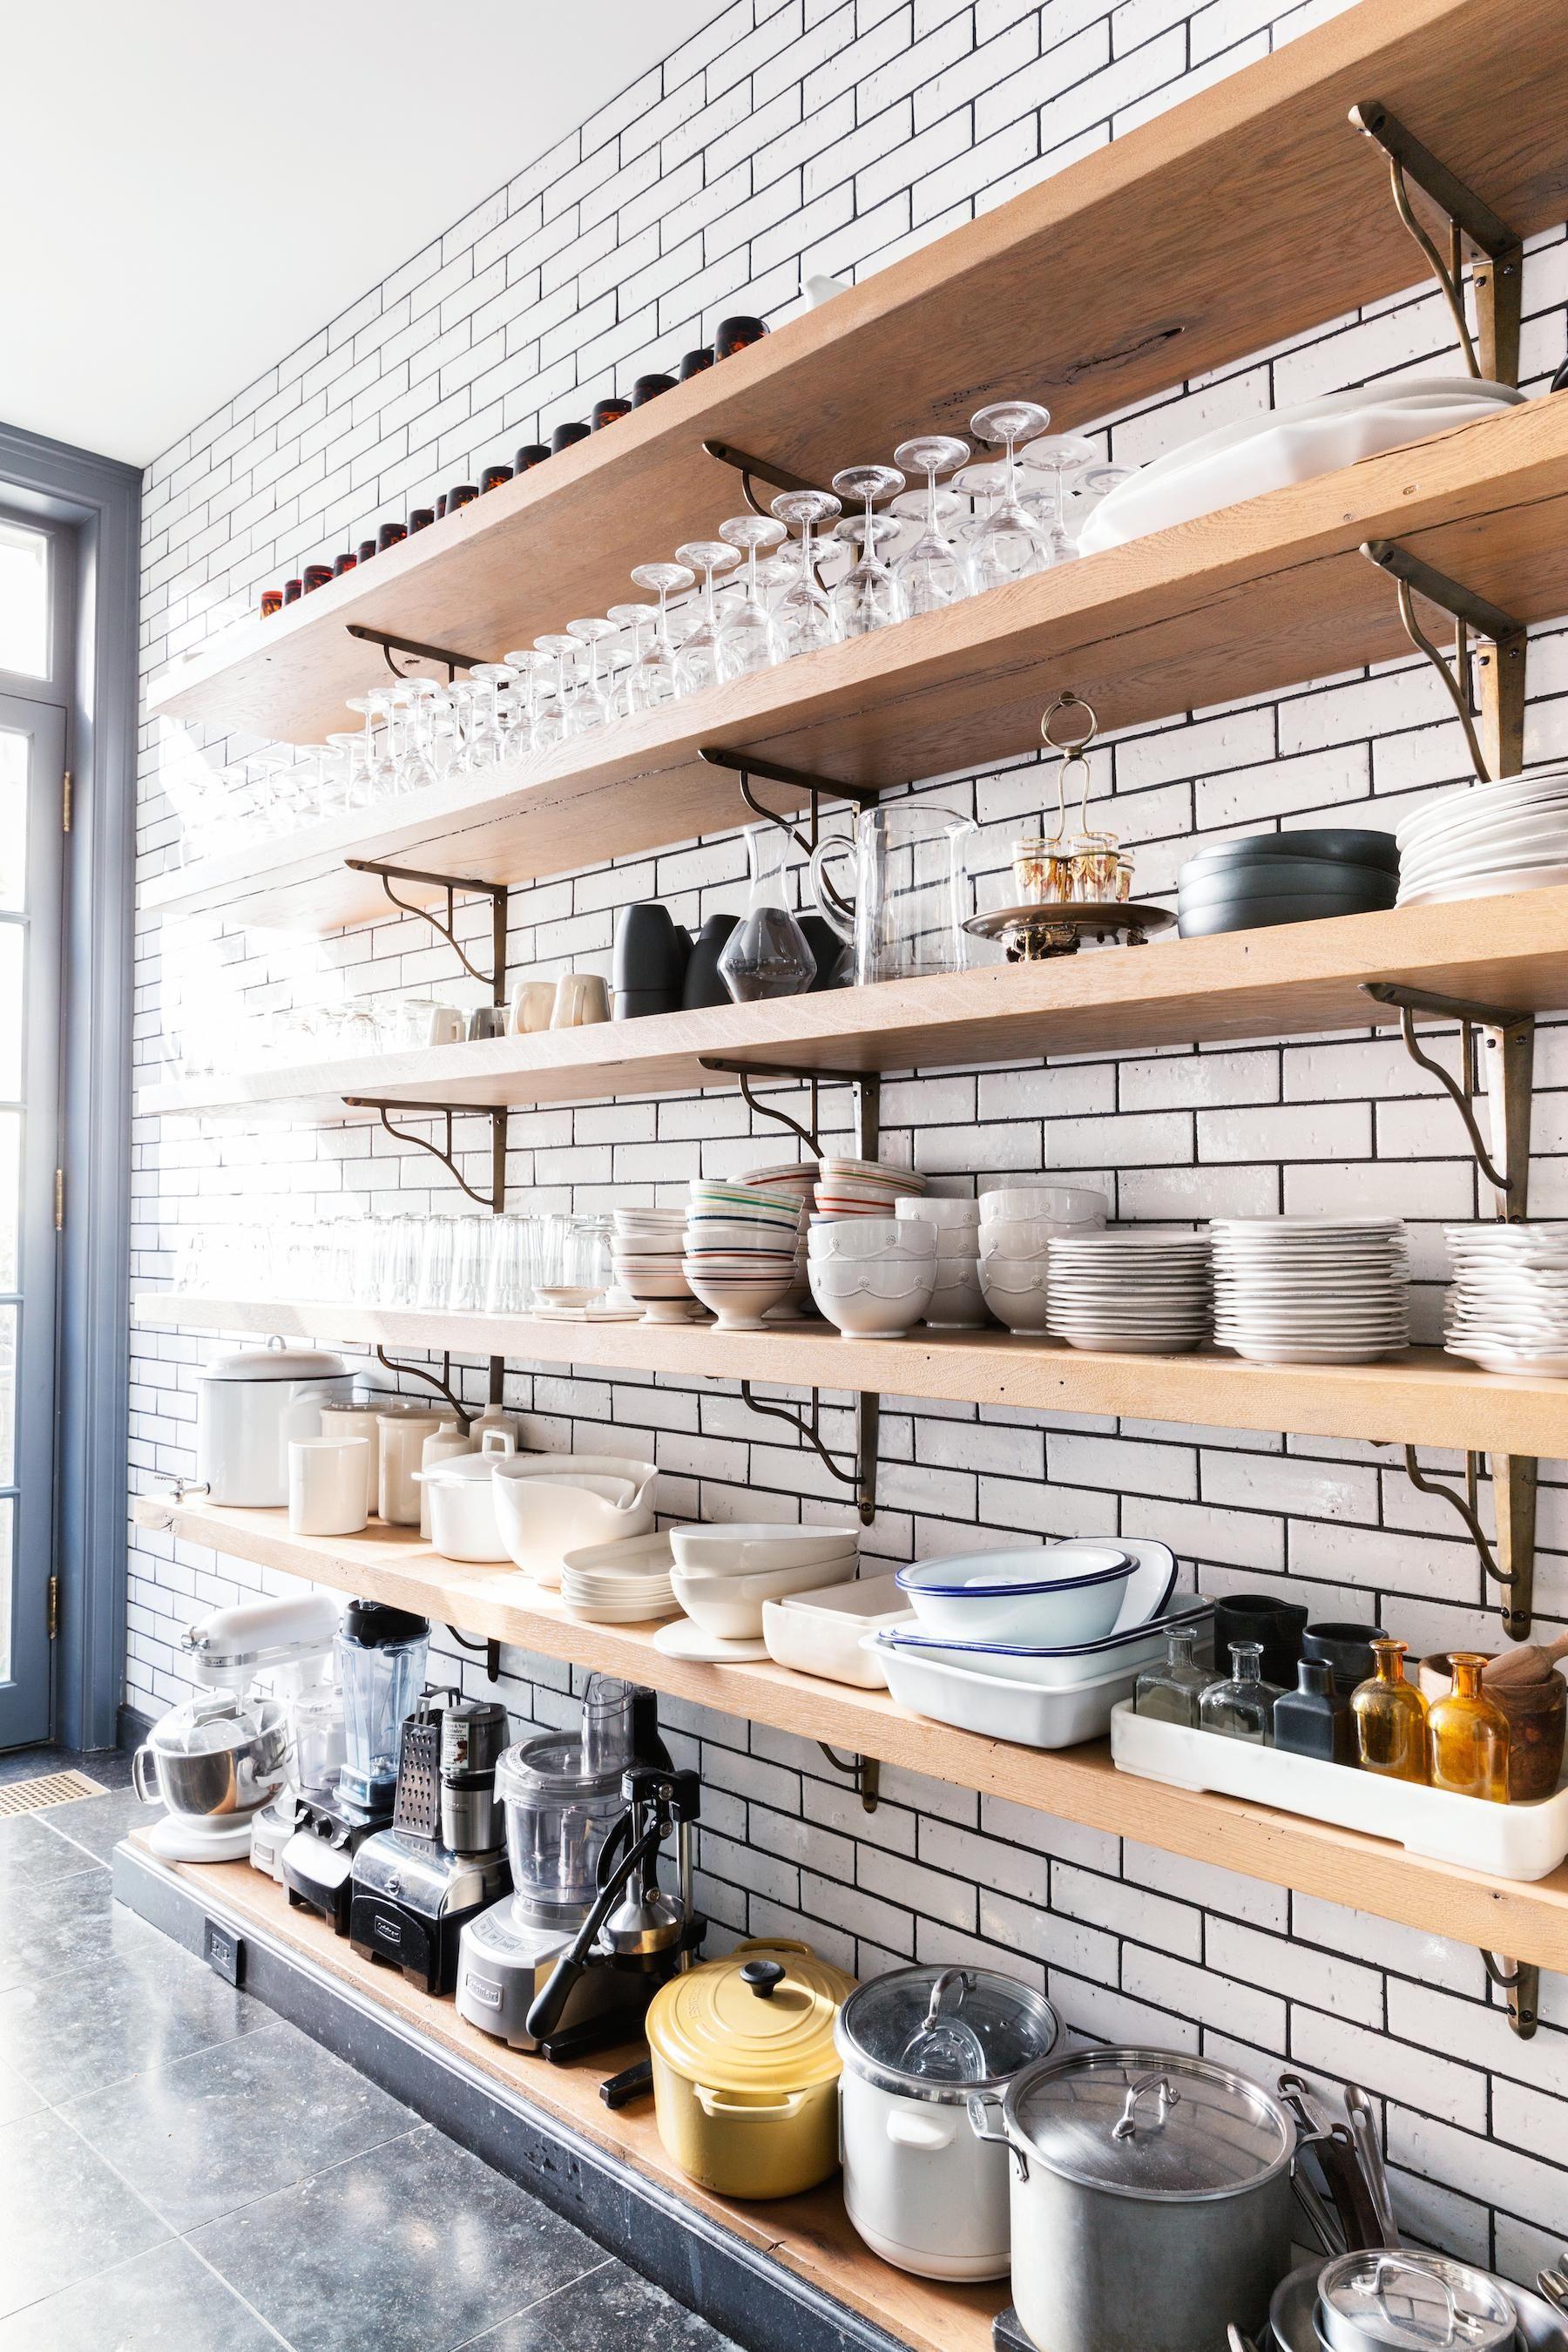 Open shelves make a kitchen so inviting!